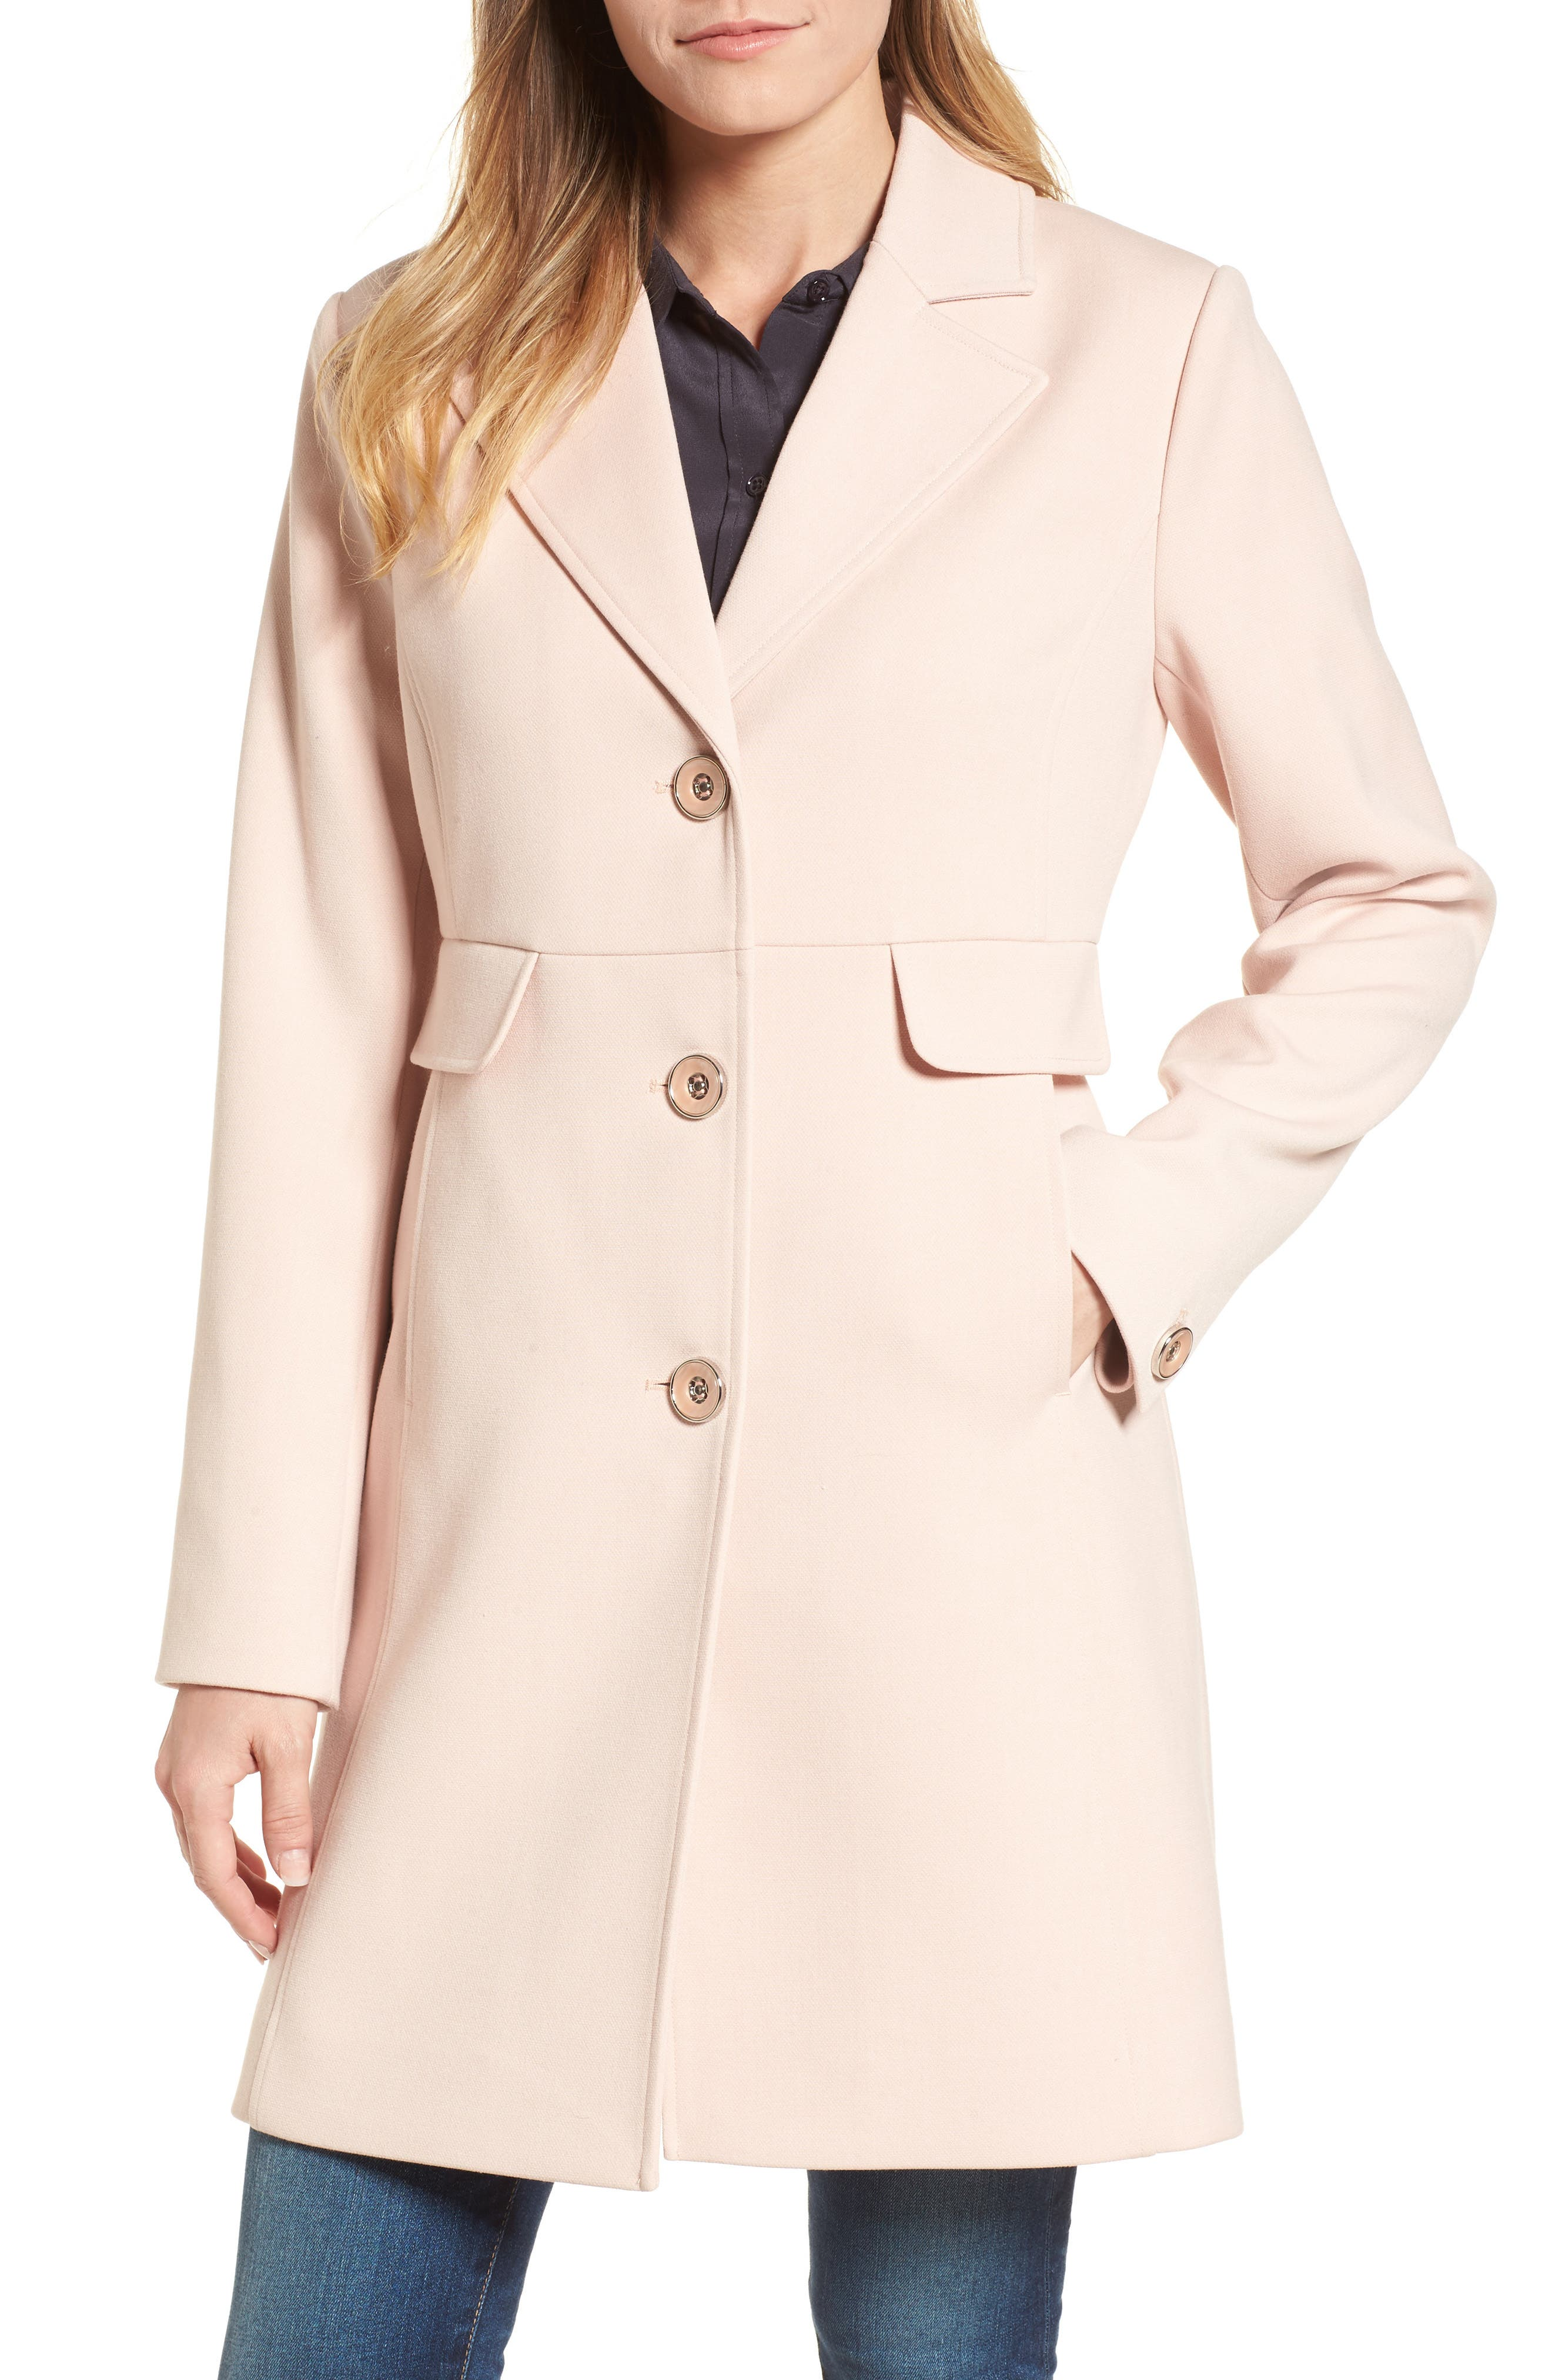 Kenneth Cole A-Line Ponte Coat,                         Main,                         color, 671